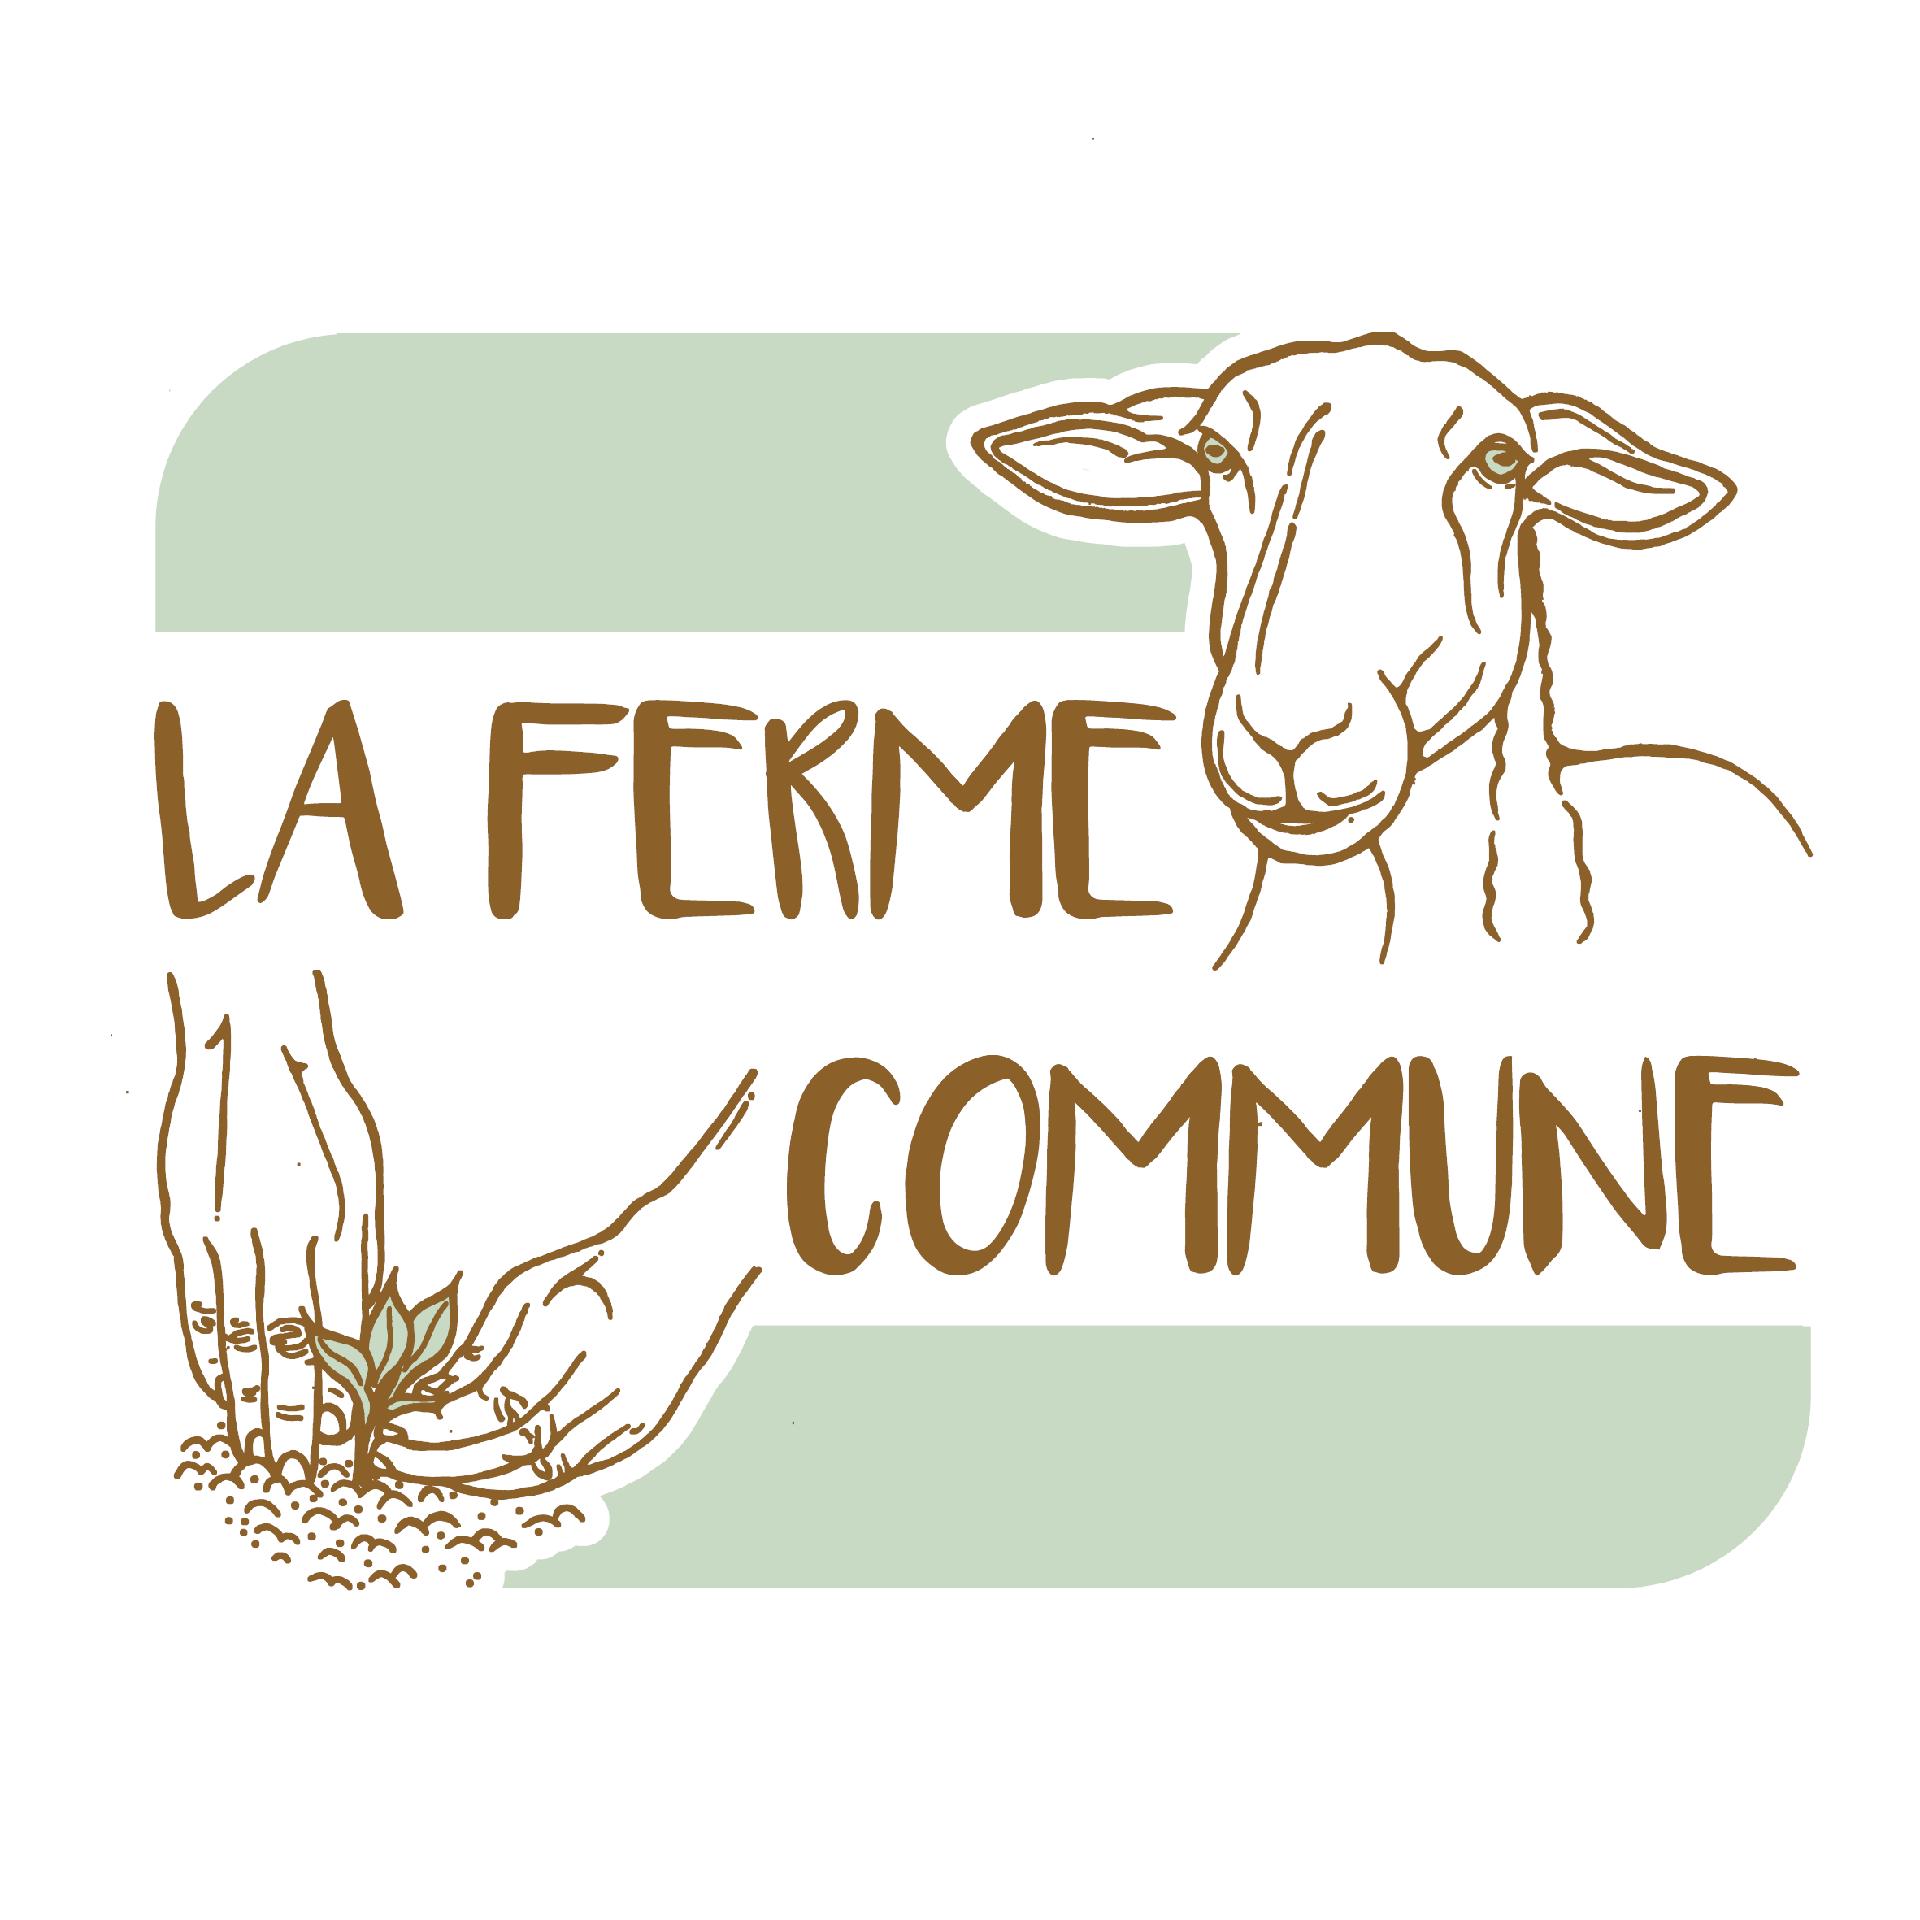 Vente de viande d'agneau et de brebis